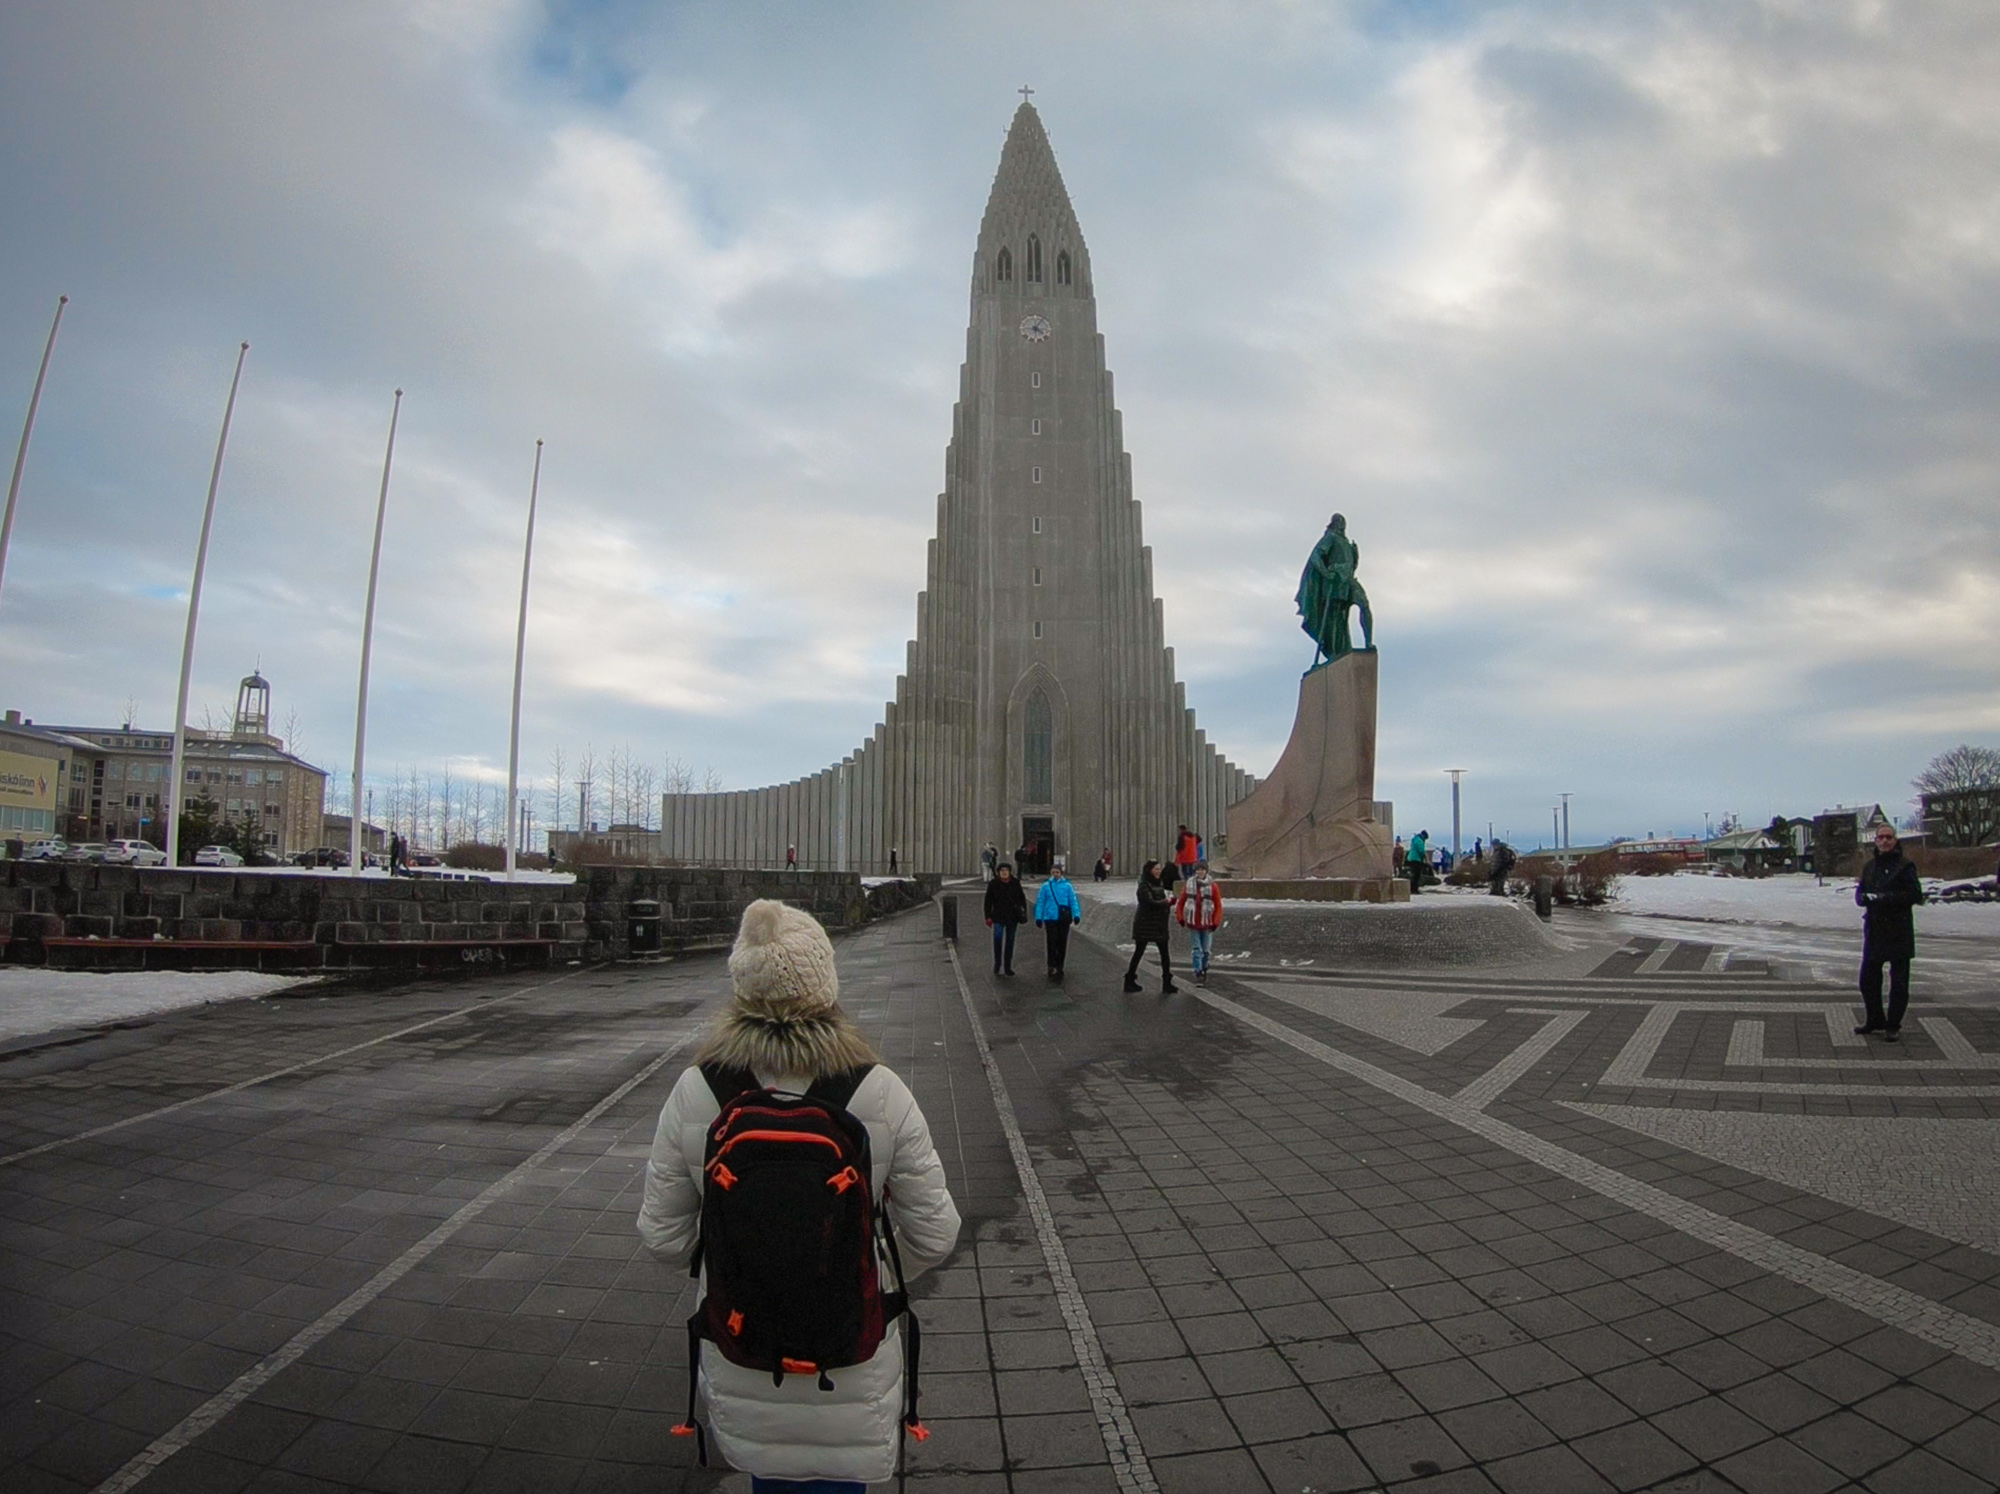 Hallgrímskirkja church Iceland www.caribbeansnowflake.com